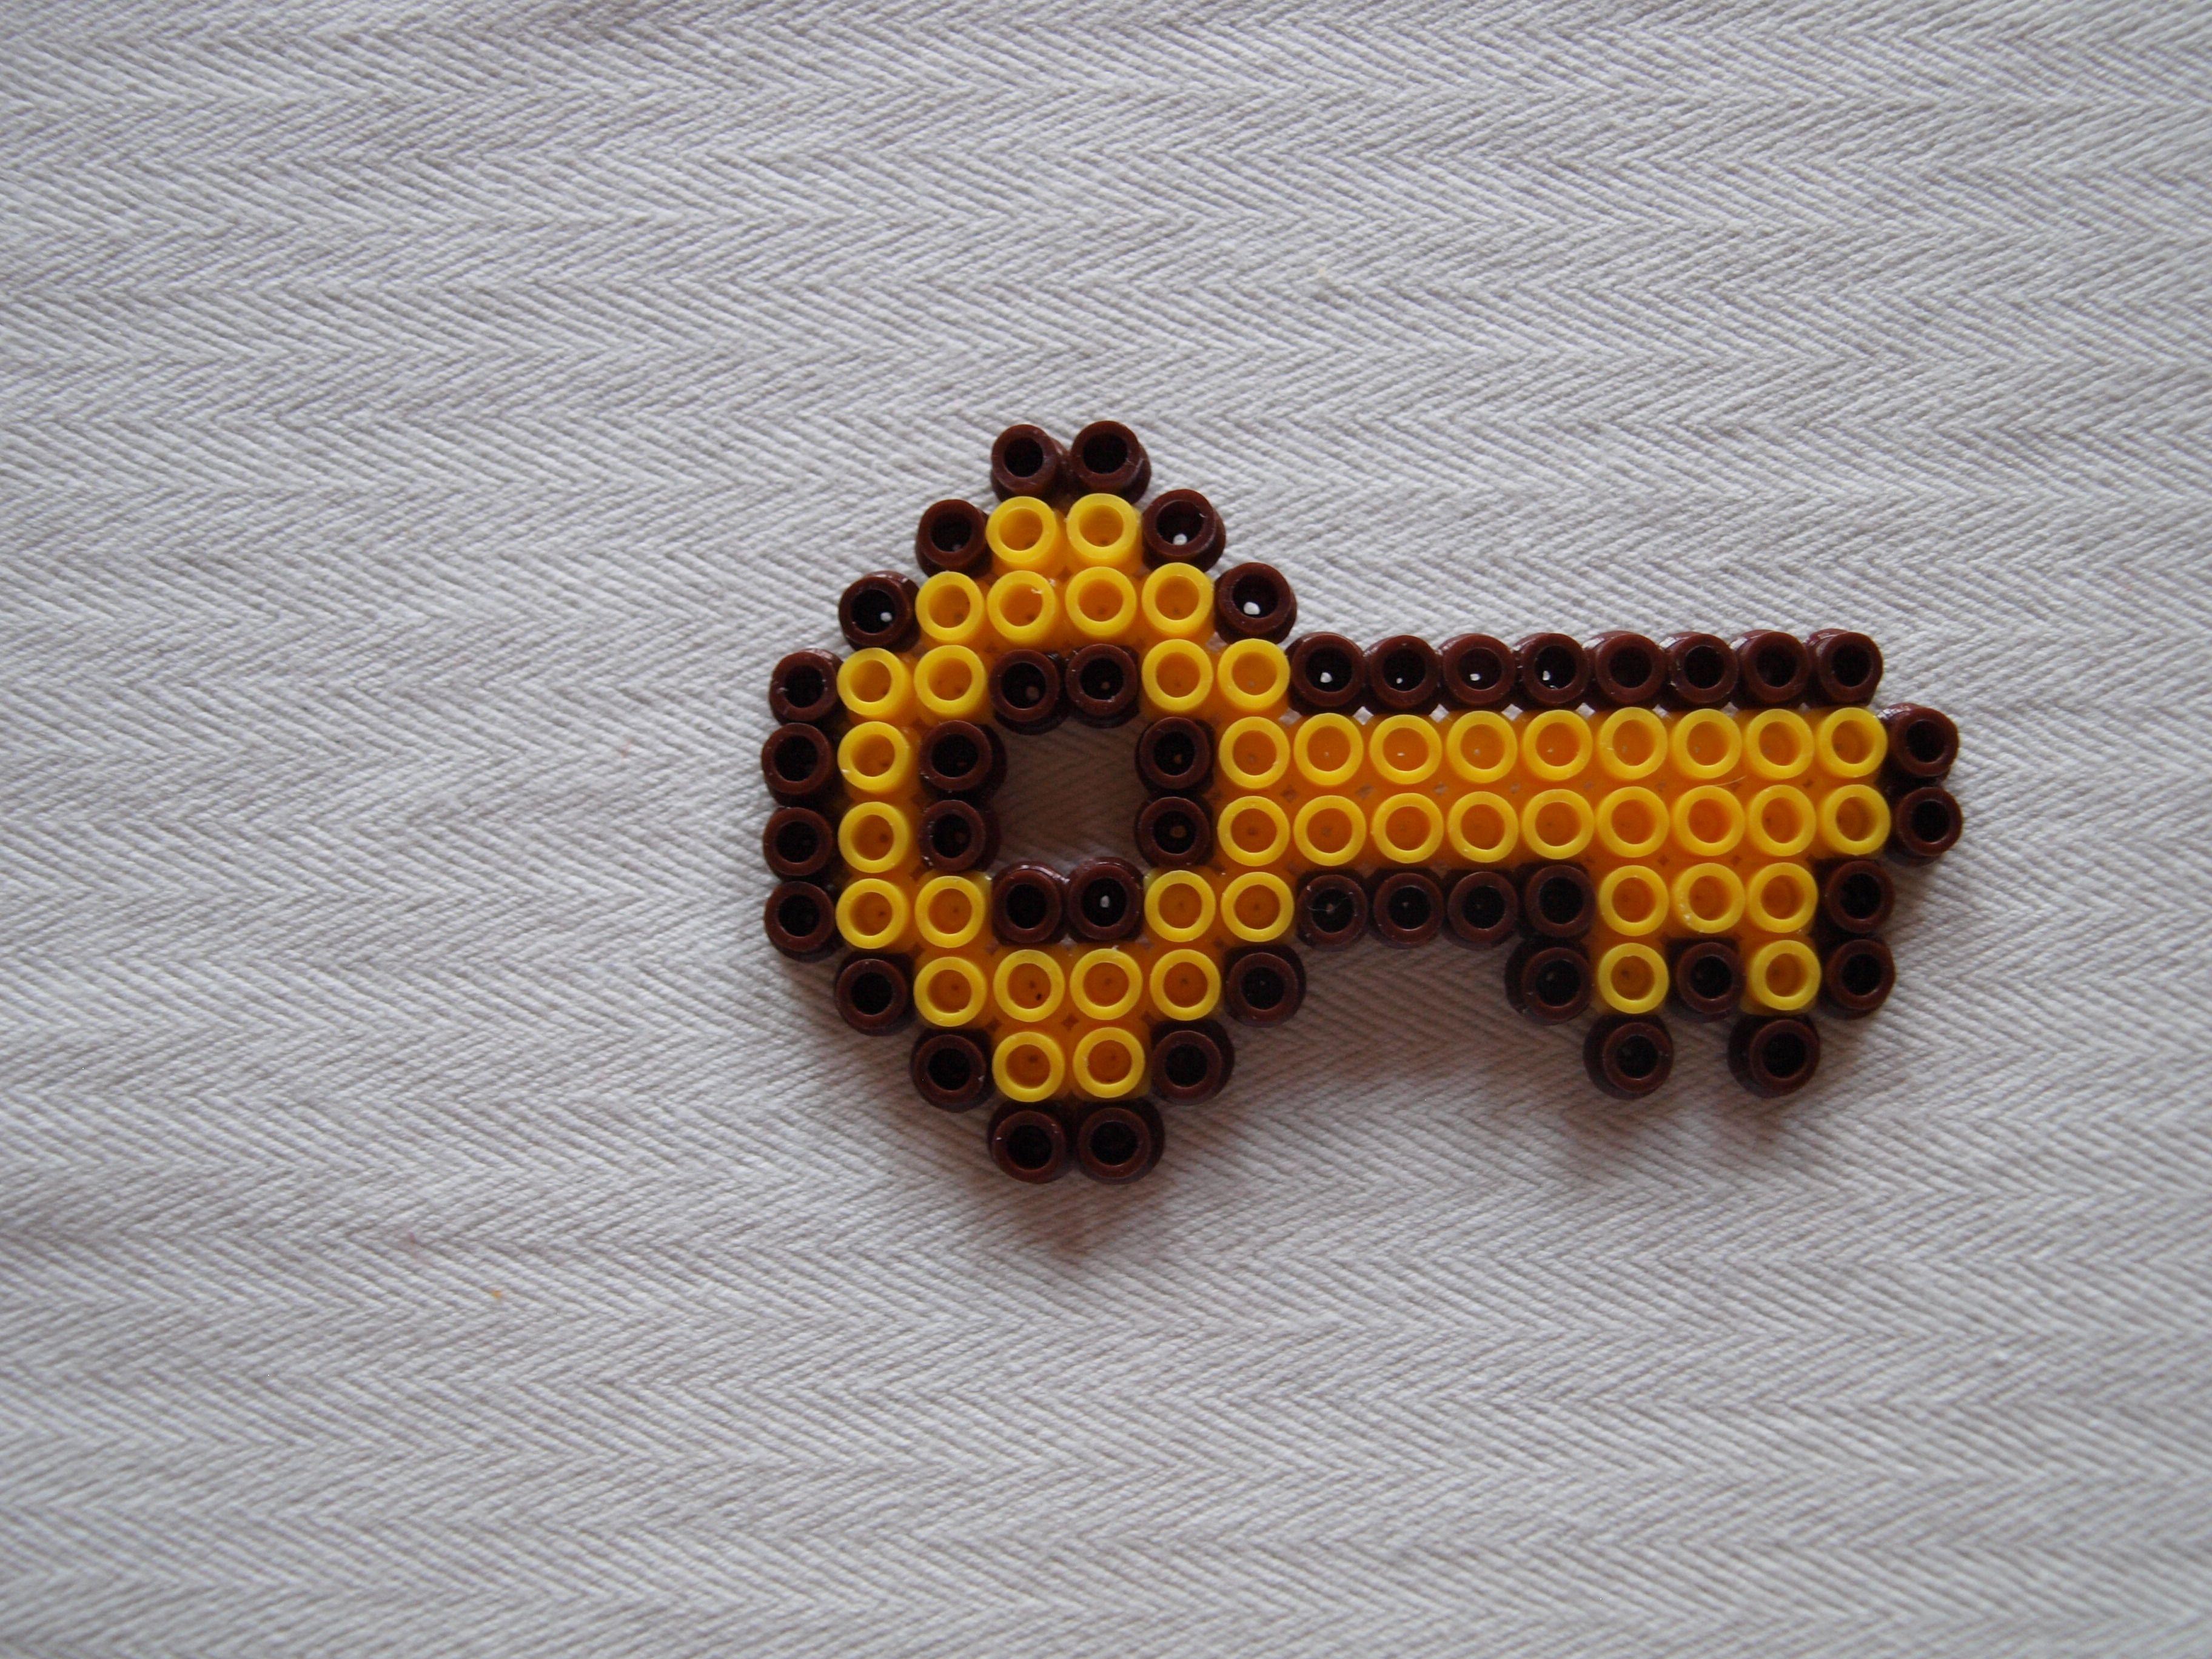 Schlüssel Aus Bügelperlen Kinderkram Pinterest Perler Beads